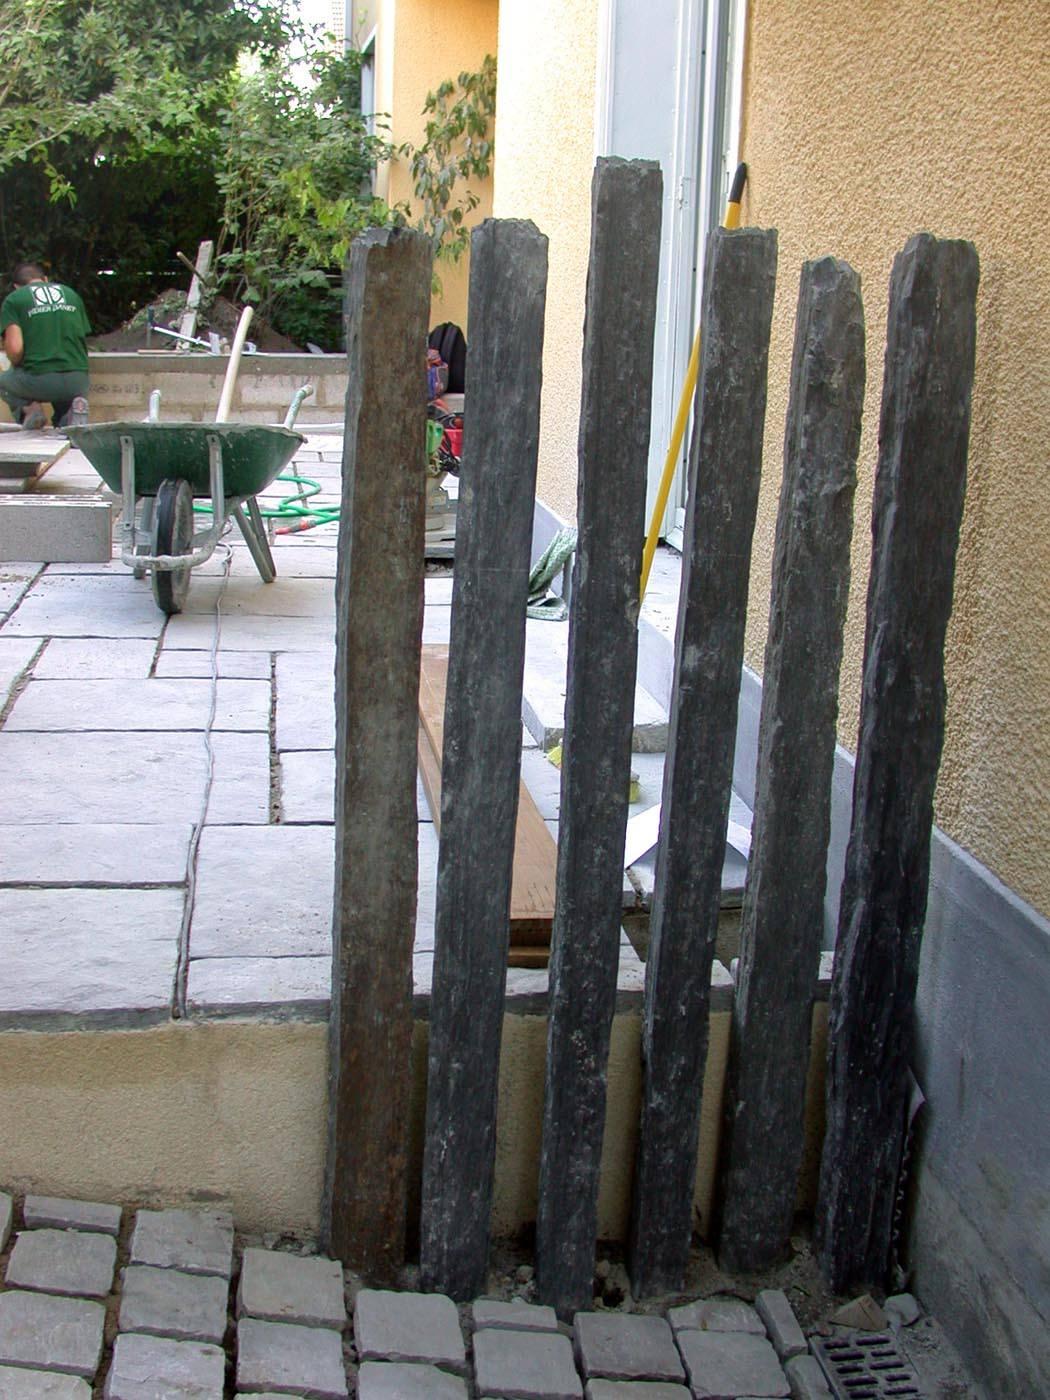 Chantier terrasse ardoise et pav s de rue jardin velours paysagiste jardinier lyon - Jardin fleuri lyon colombes ...